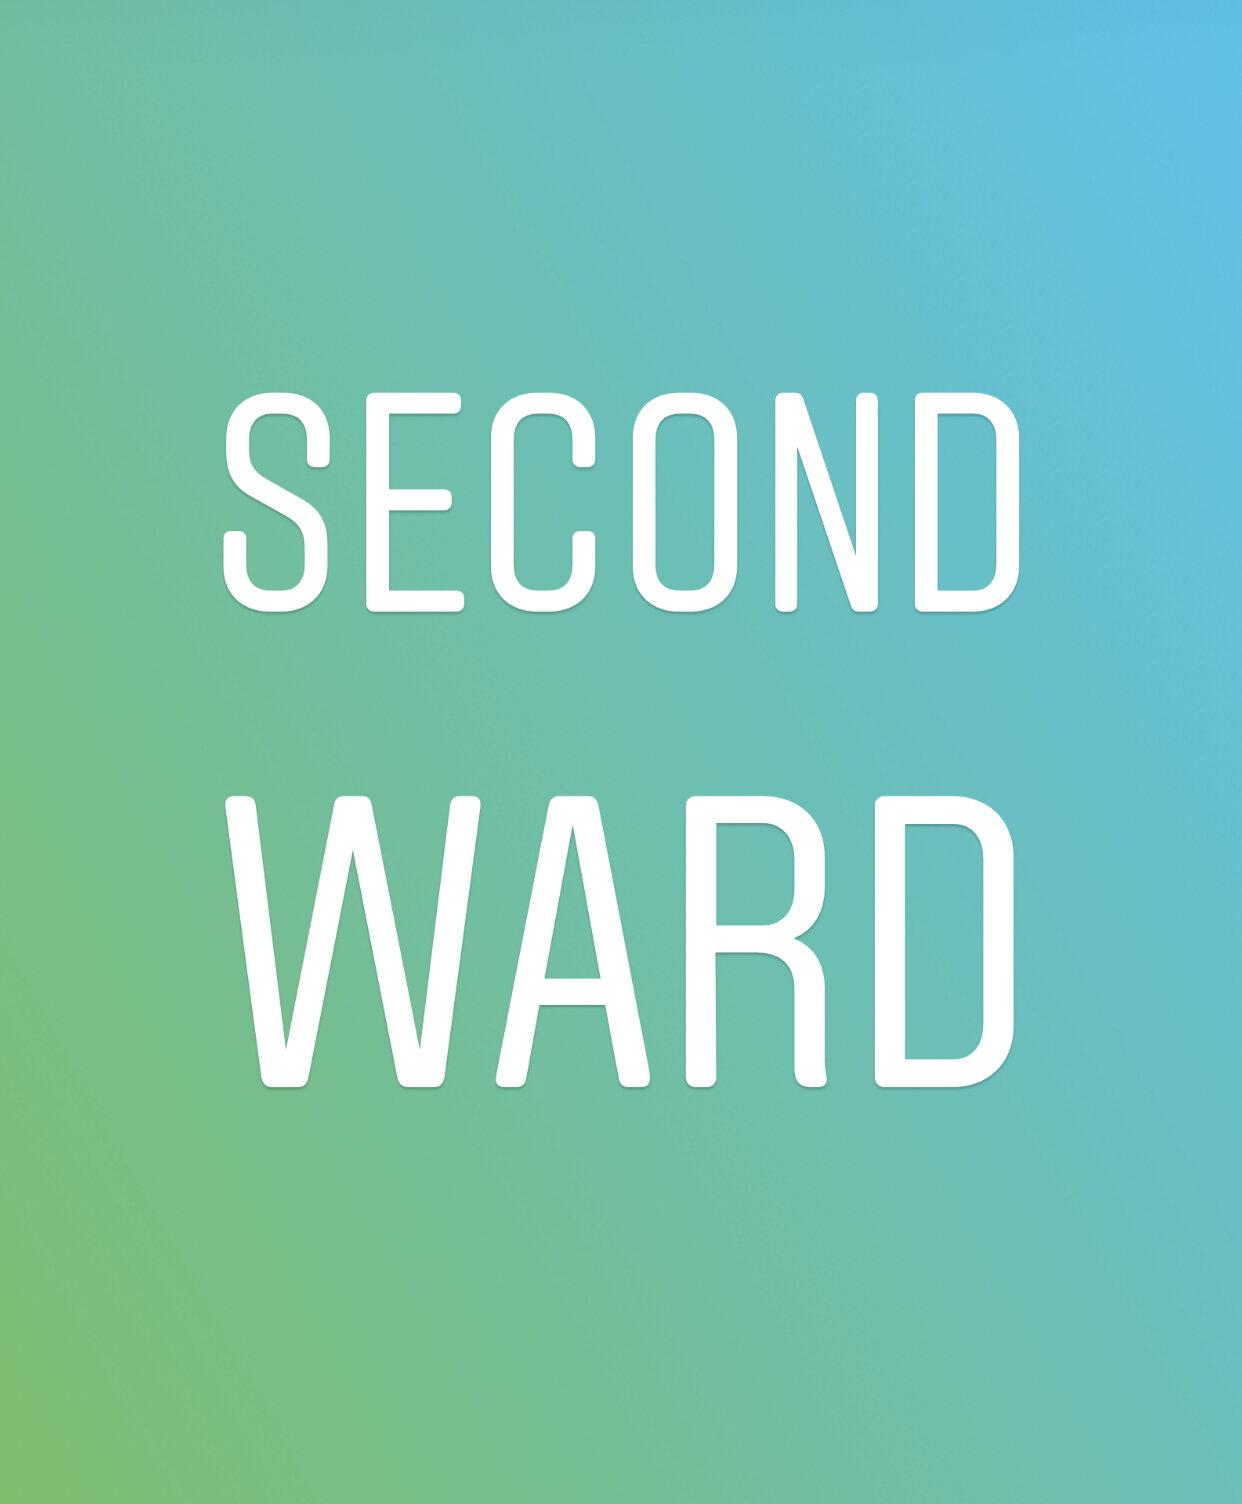 #RTHxSECONDWARD